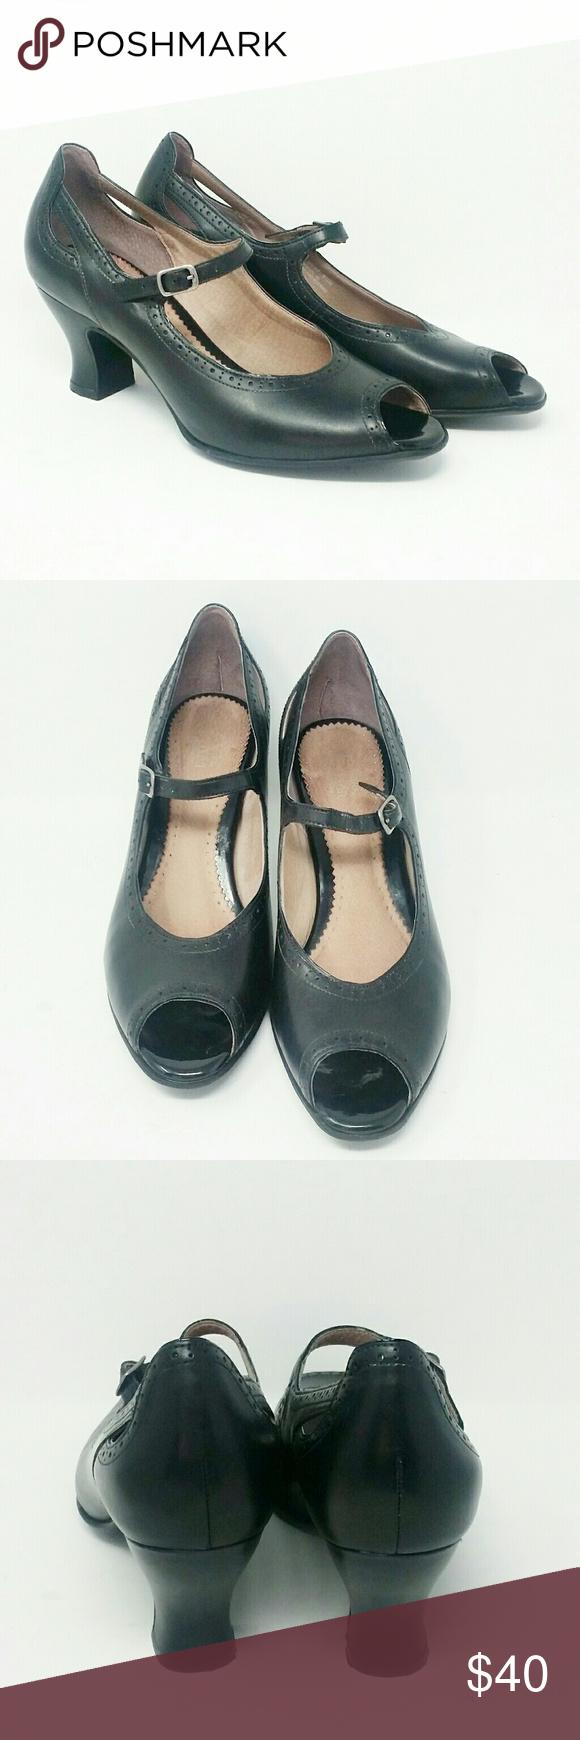 27b58fdc940 Clarks Black Mary Jane Heel Artisan Clark mary jane heel with open toe Size  9 1 2 Heel height approximately 2 1 2